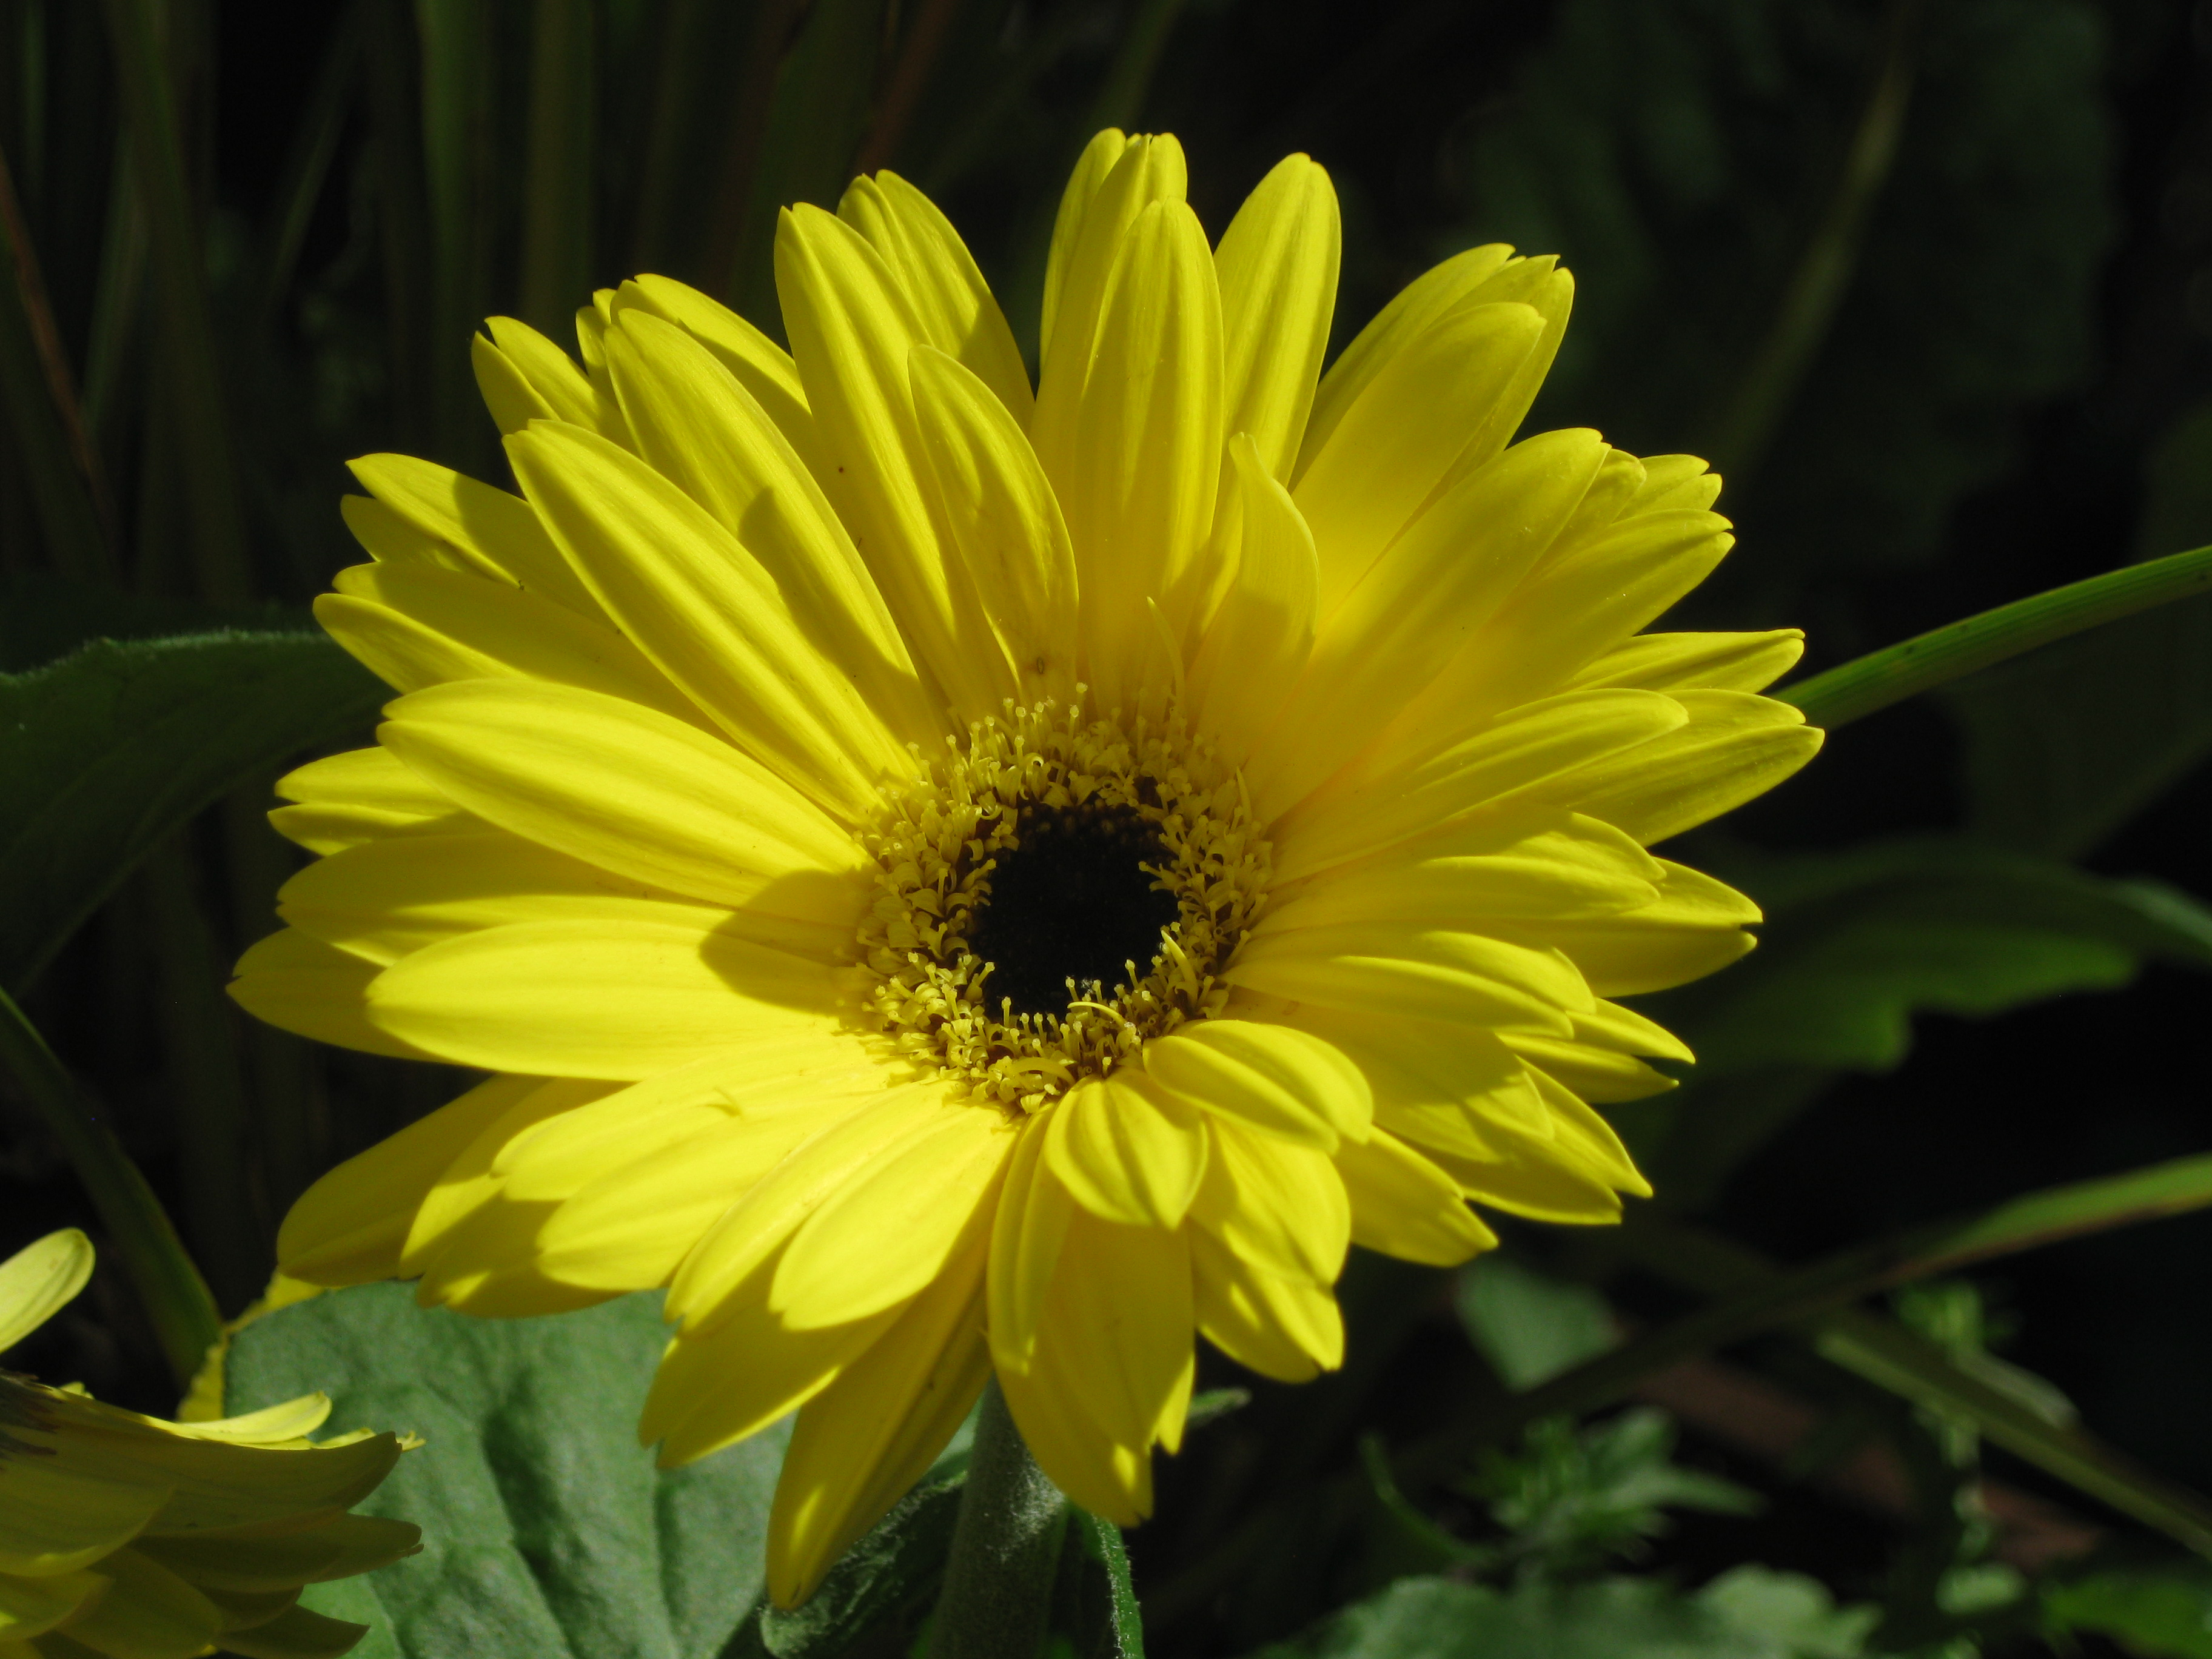 Friendship flower pics - Flowers that mean friendship ...